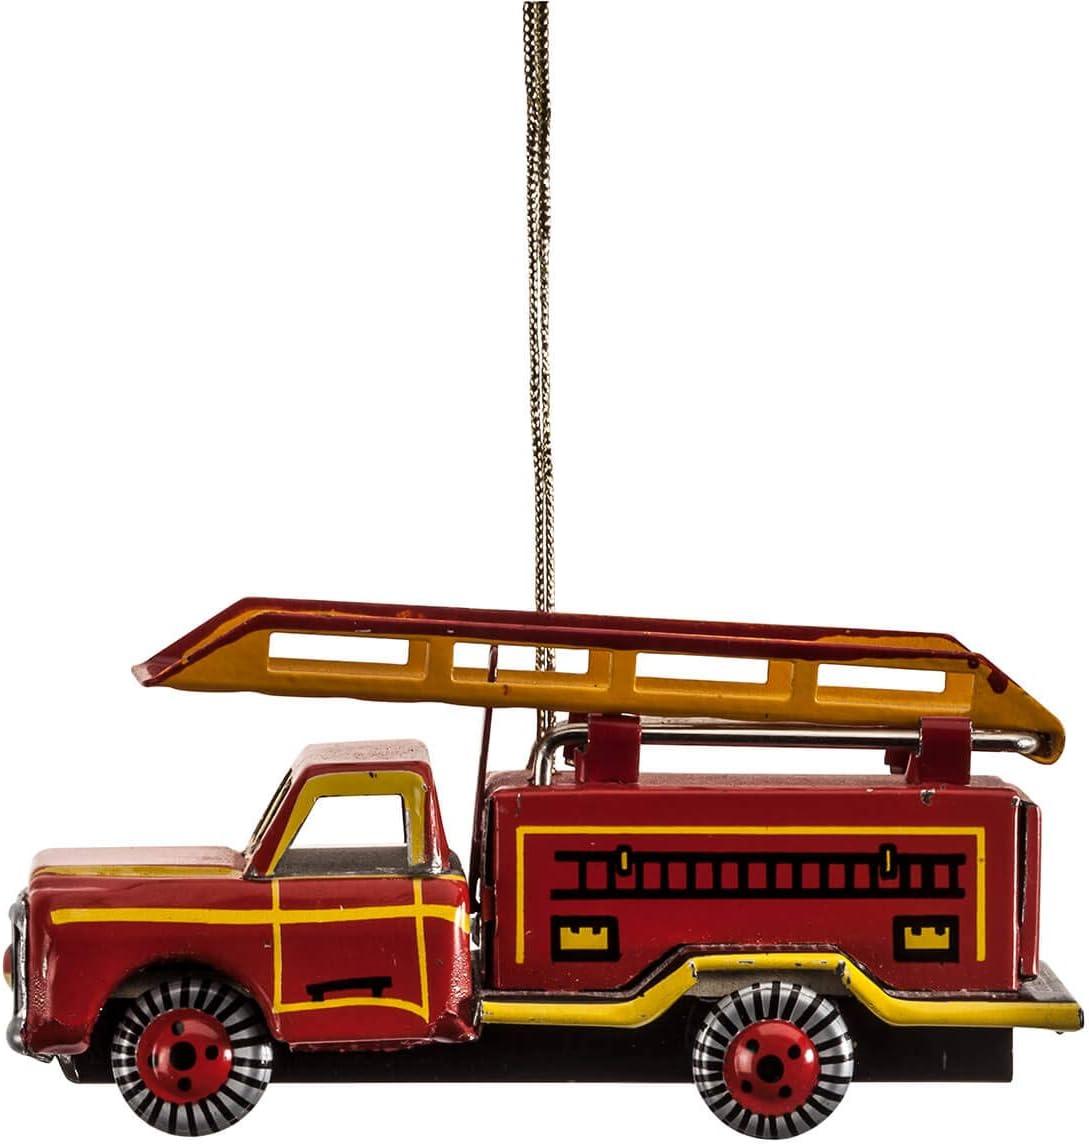 Alexander Taron AT3 Collectible Tin Ornament Red 1.5 H x 1.25 W x 3.25 D Fire Truck